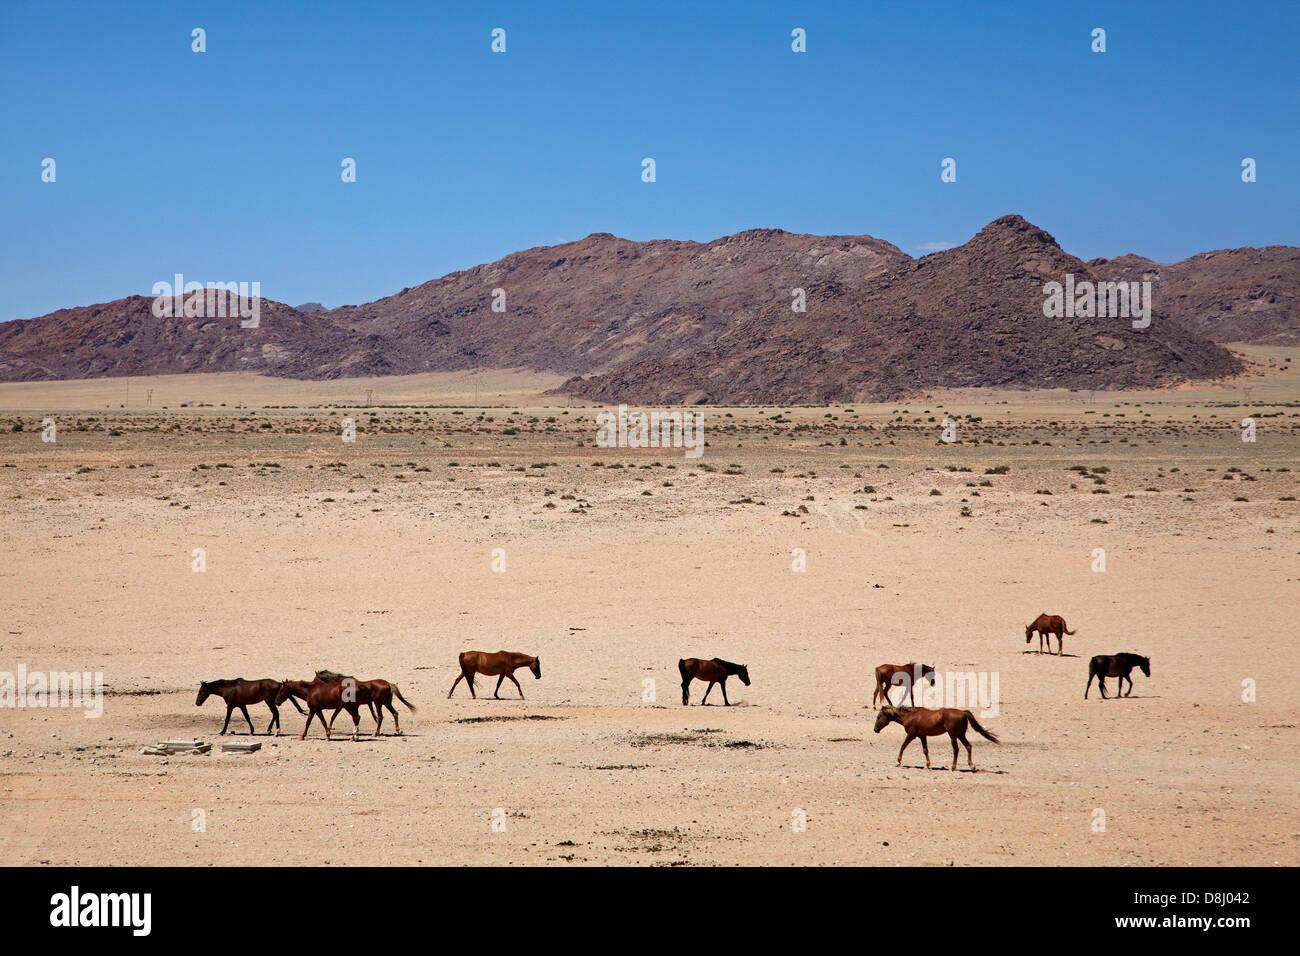 Wild horses, Garub, Namib-Naukluft National Park, near Aus, Southern Namibia, Africa - Stock Image